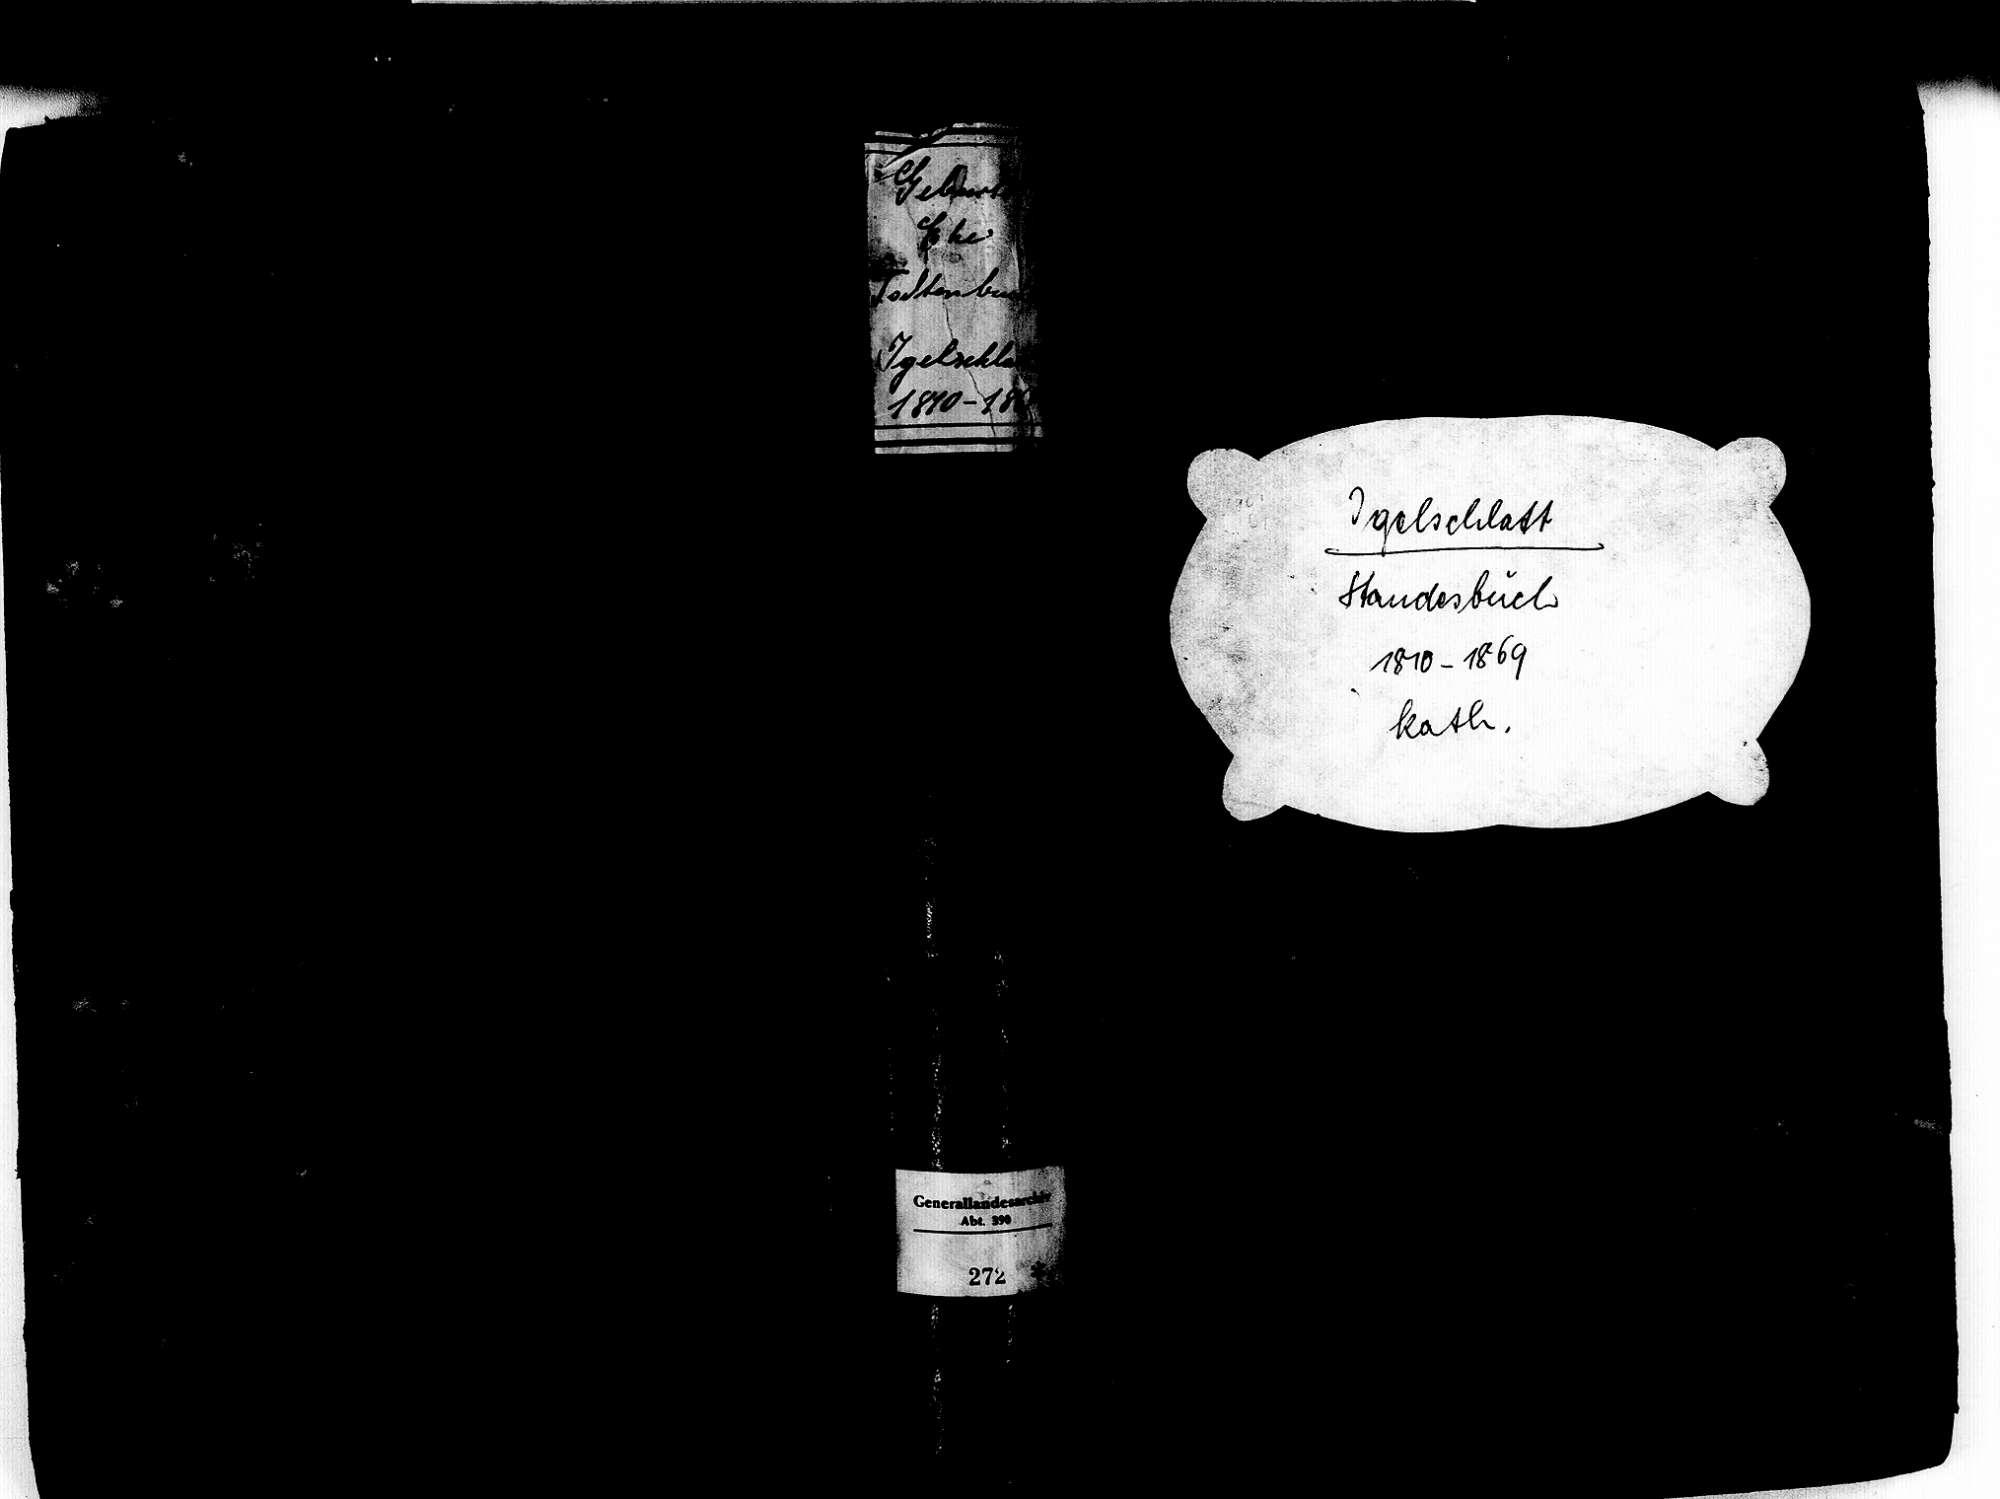 Igelschlatt, Birkendof Ühlingen-Birkendorf WT; Katholische Gemeinde: Standesbuch 1810-1869, Bild 1